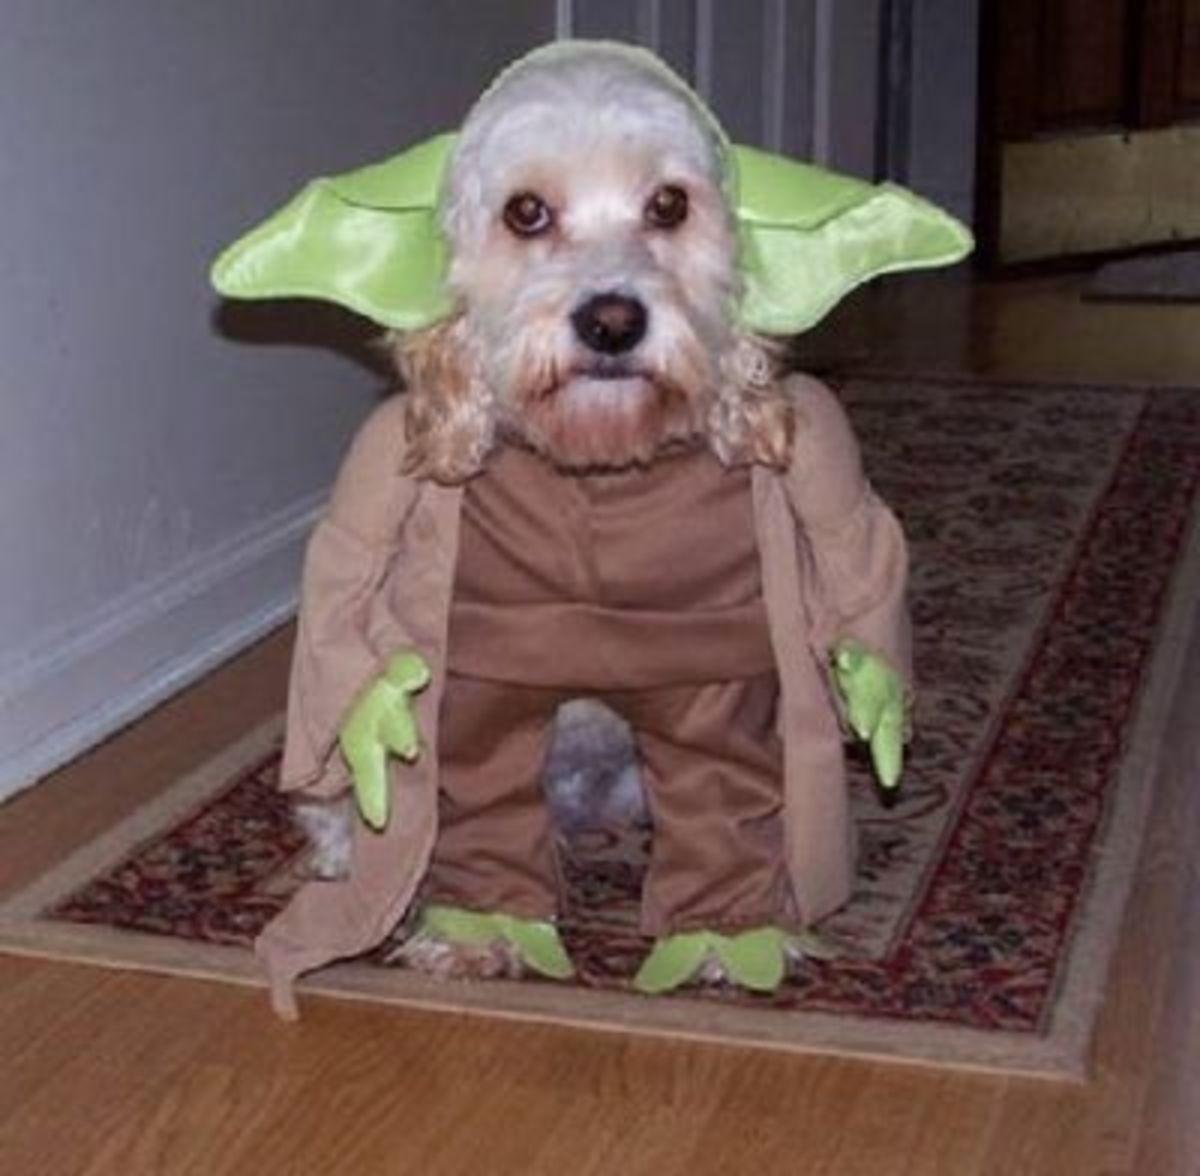 October 14th - Yoda